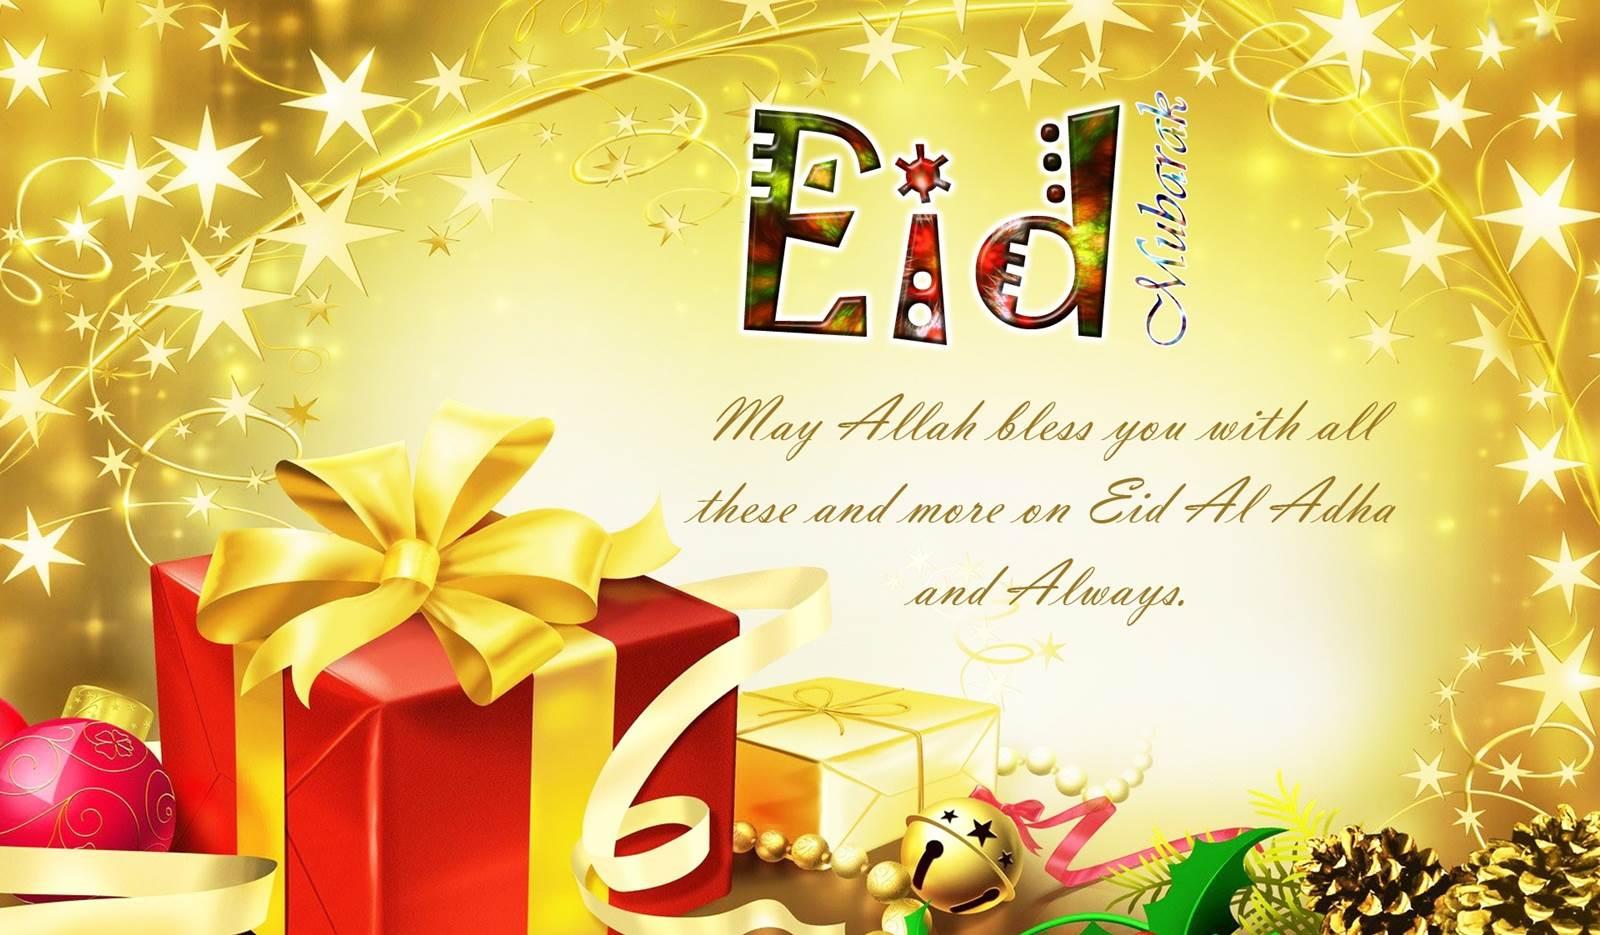 Eid Al Adha Mubarak Wallpapers Eid Greeting Cards Xcitefun